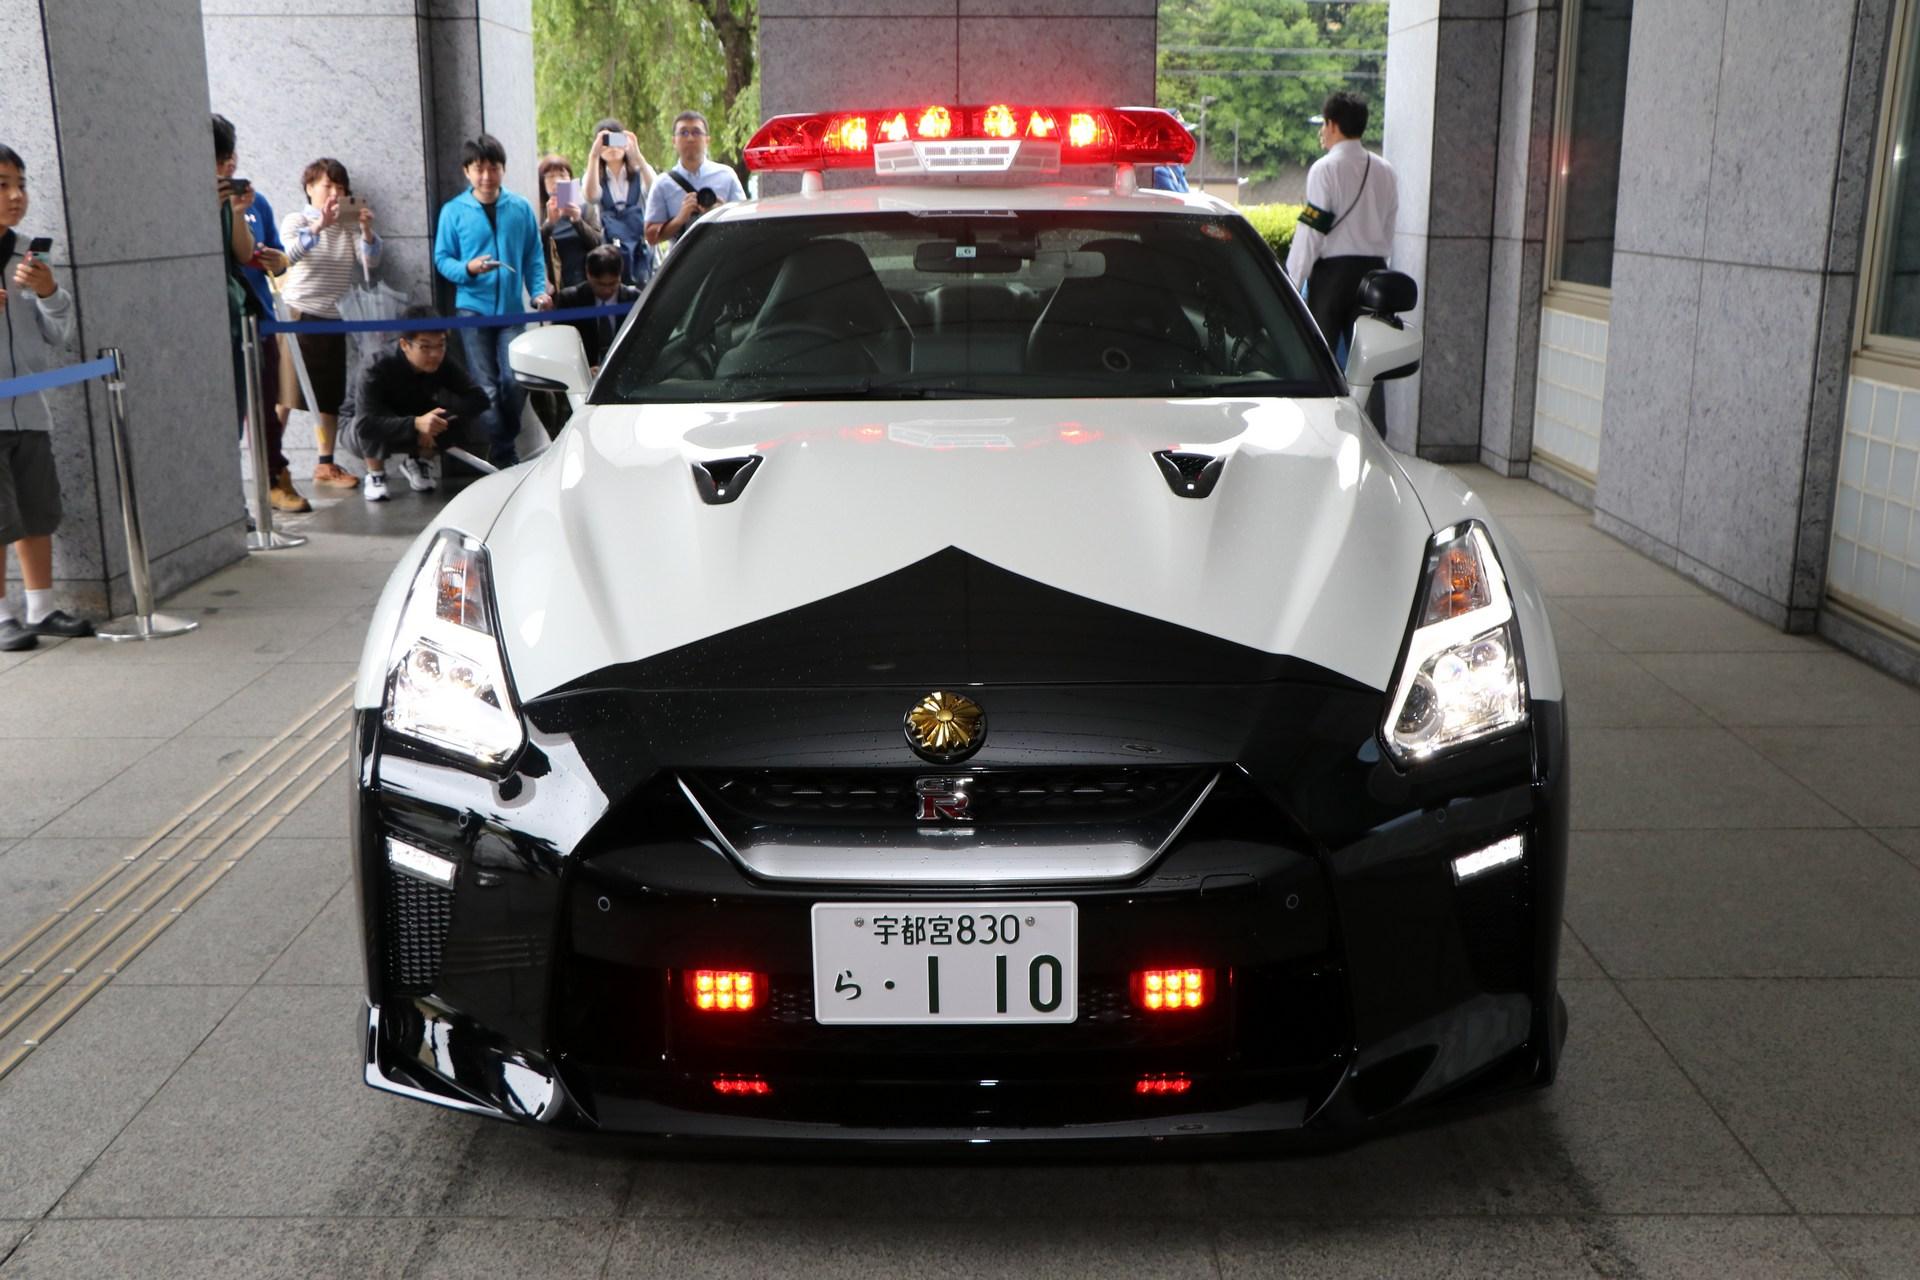 Nissan_GT-R_Police_Car_0004